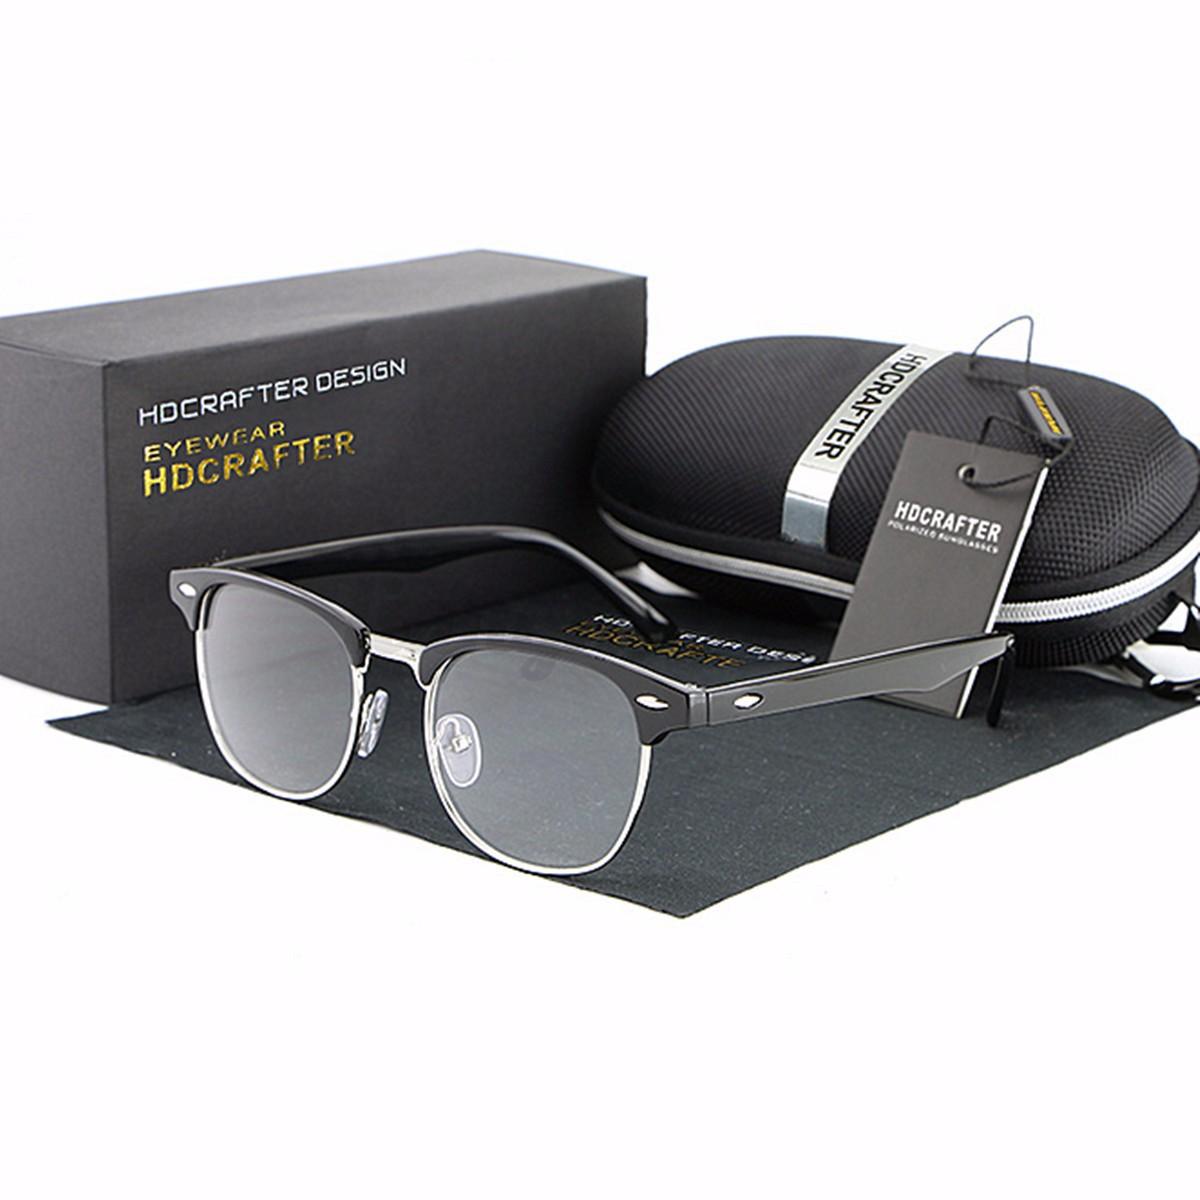 femme homme monture lunettes optique lecture vue verre loupe myopie presbyte ebay. Black Bedroom Furniture Sets. Home Design Ideas